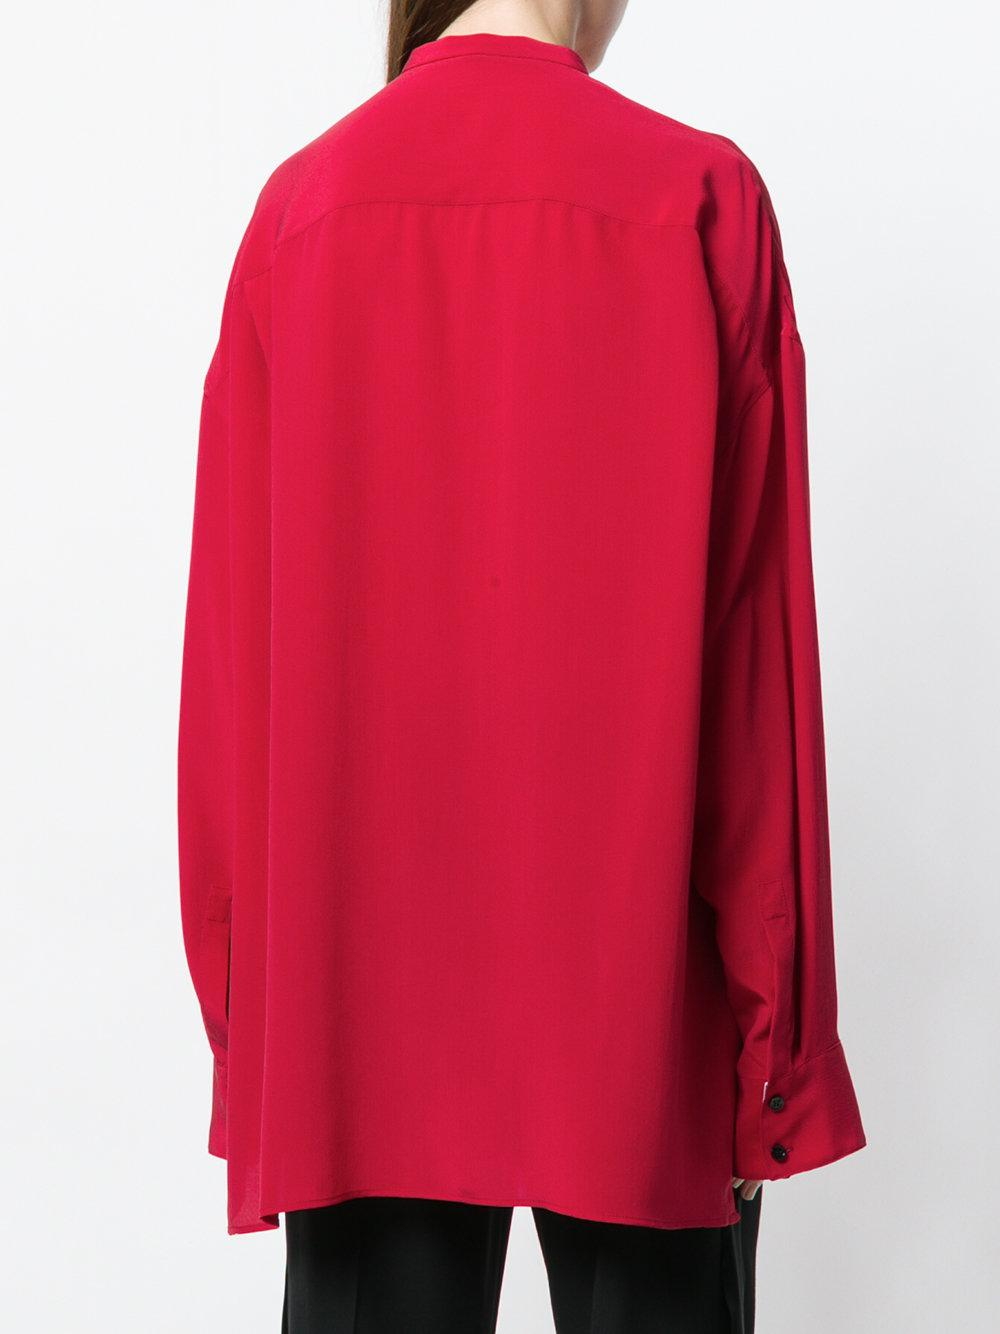 5eea4191c Lyst - Haider Ackermann Oversized Classic Shirt in Red